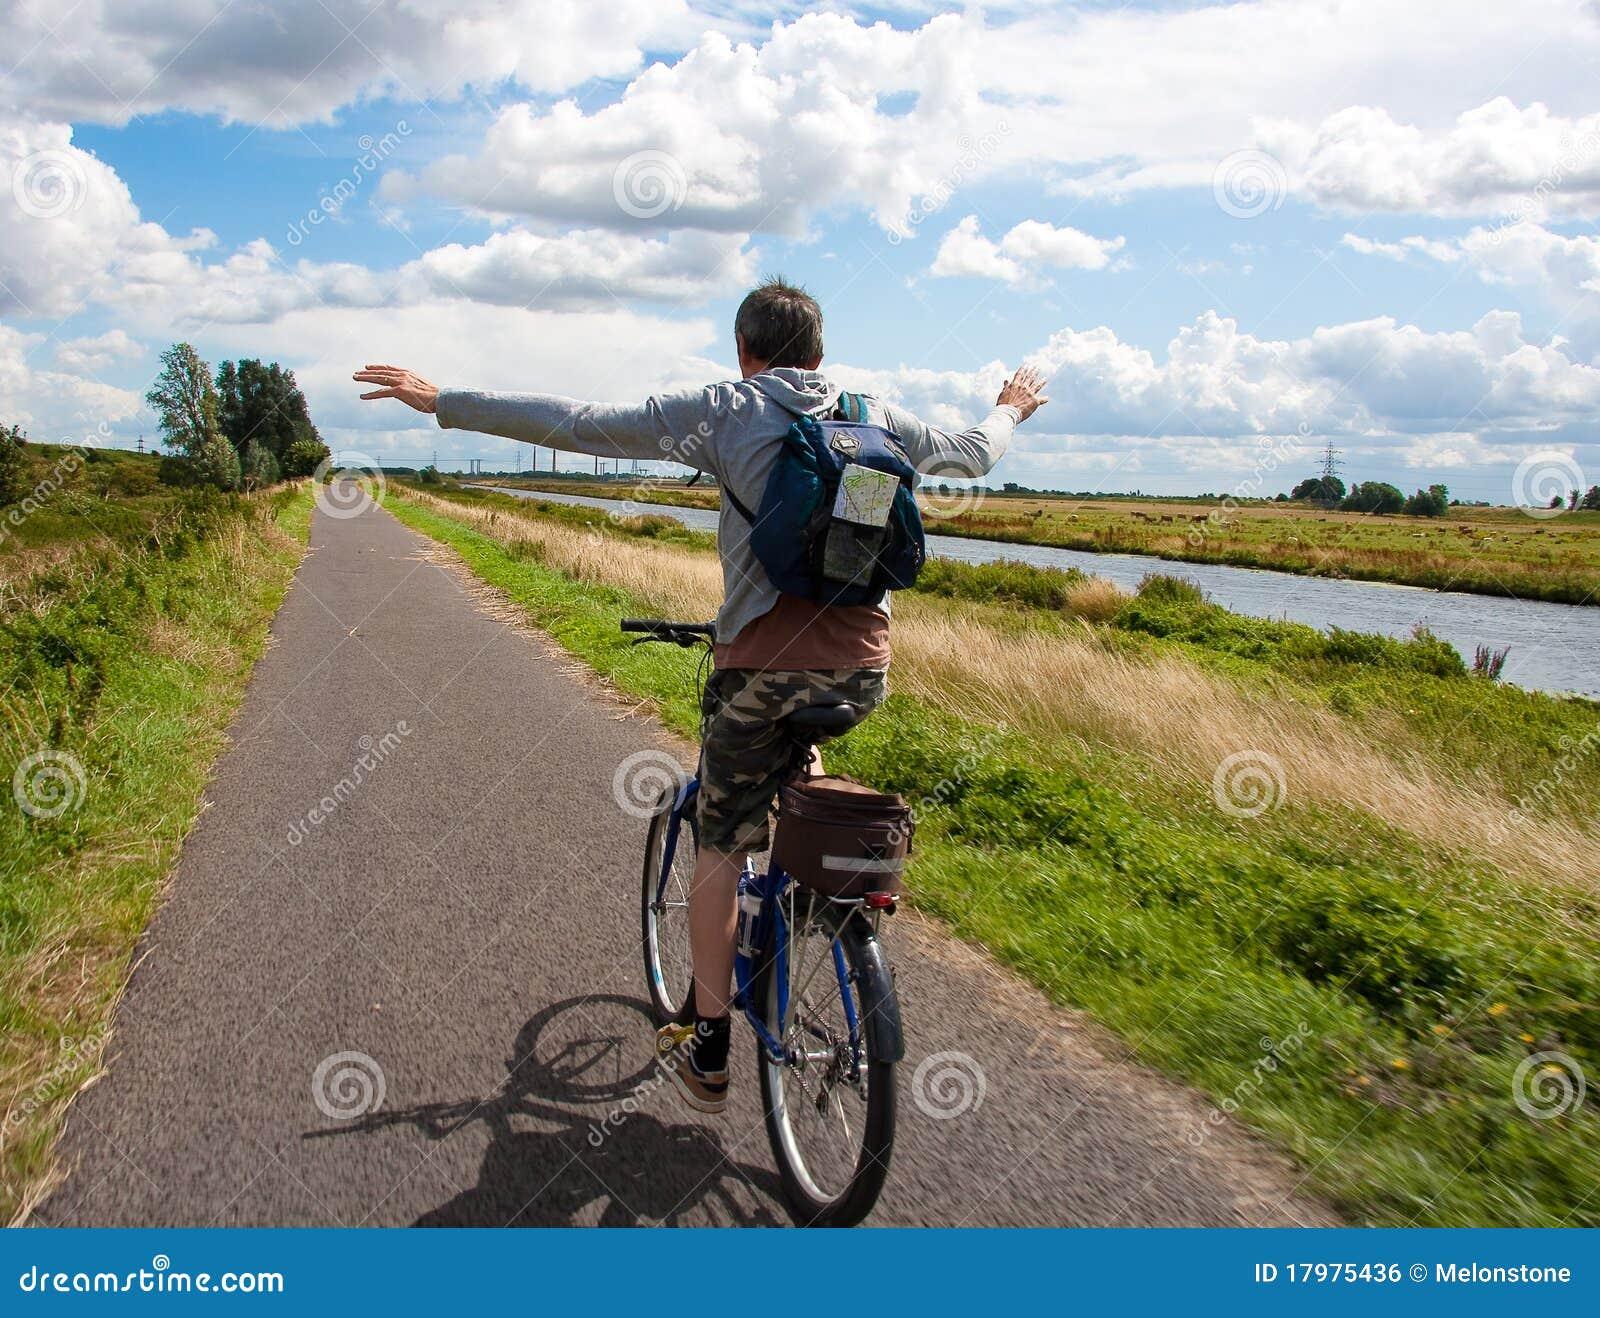 essay pleasure riding bicycle